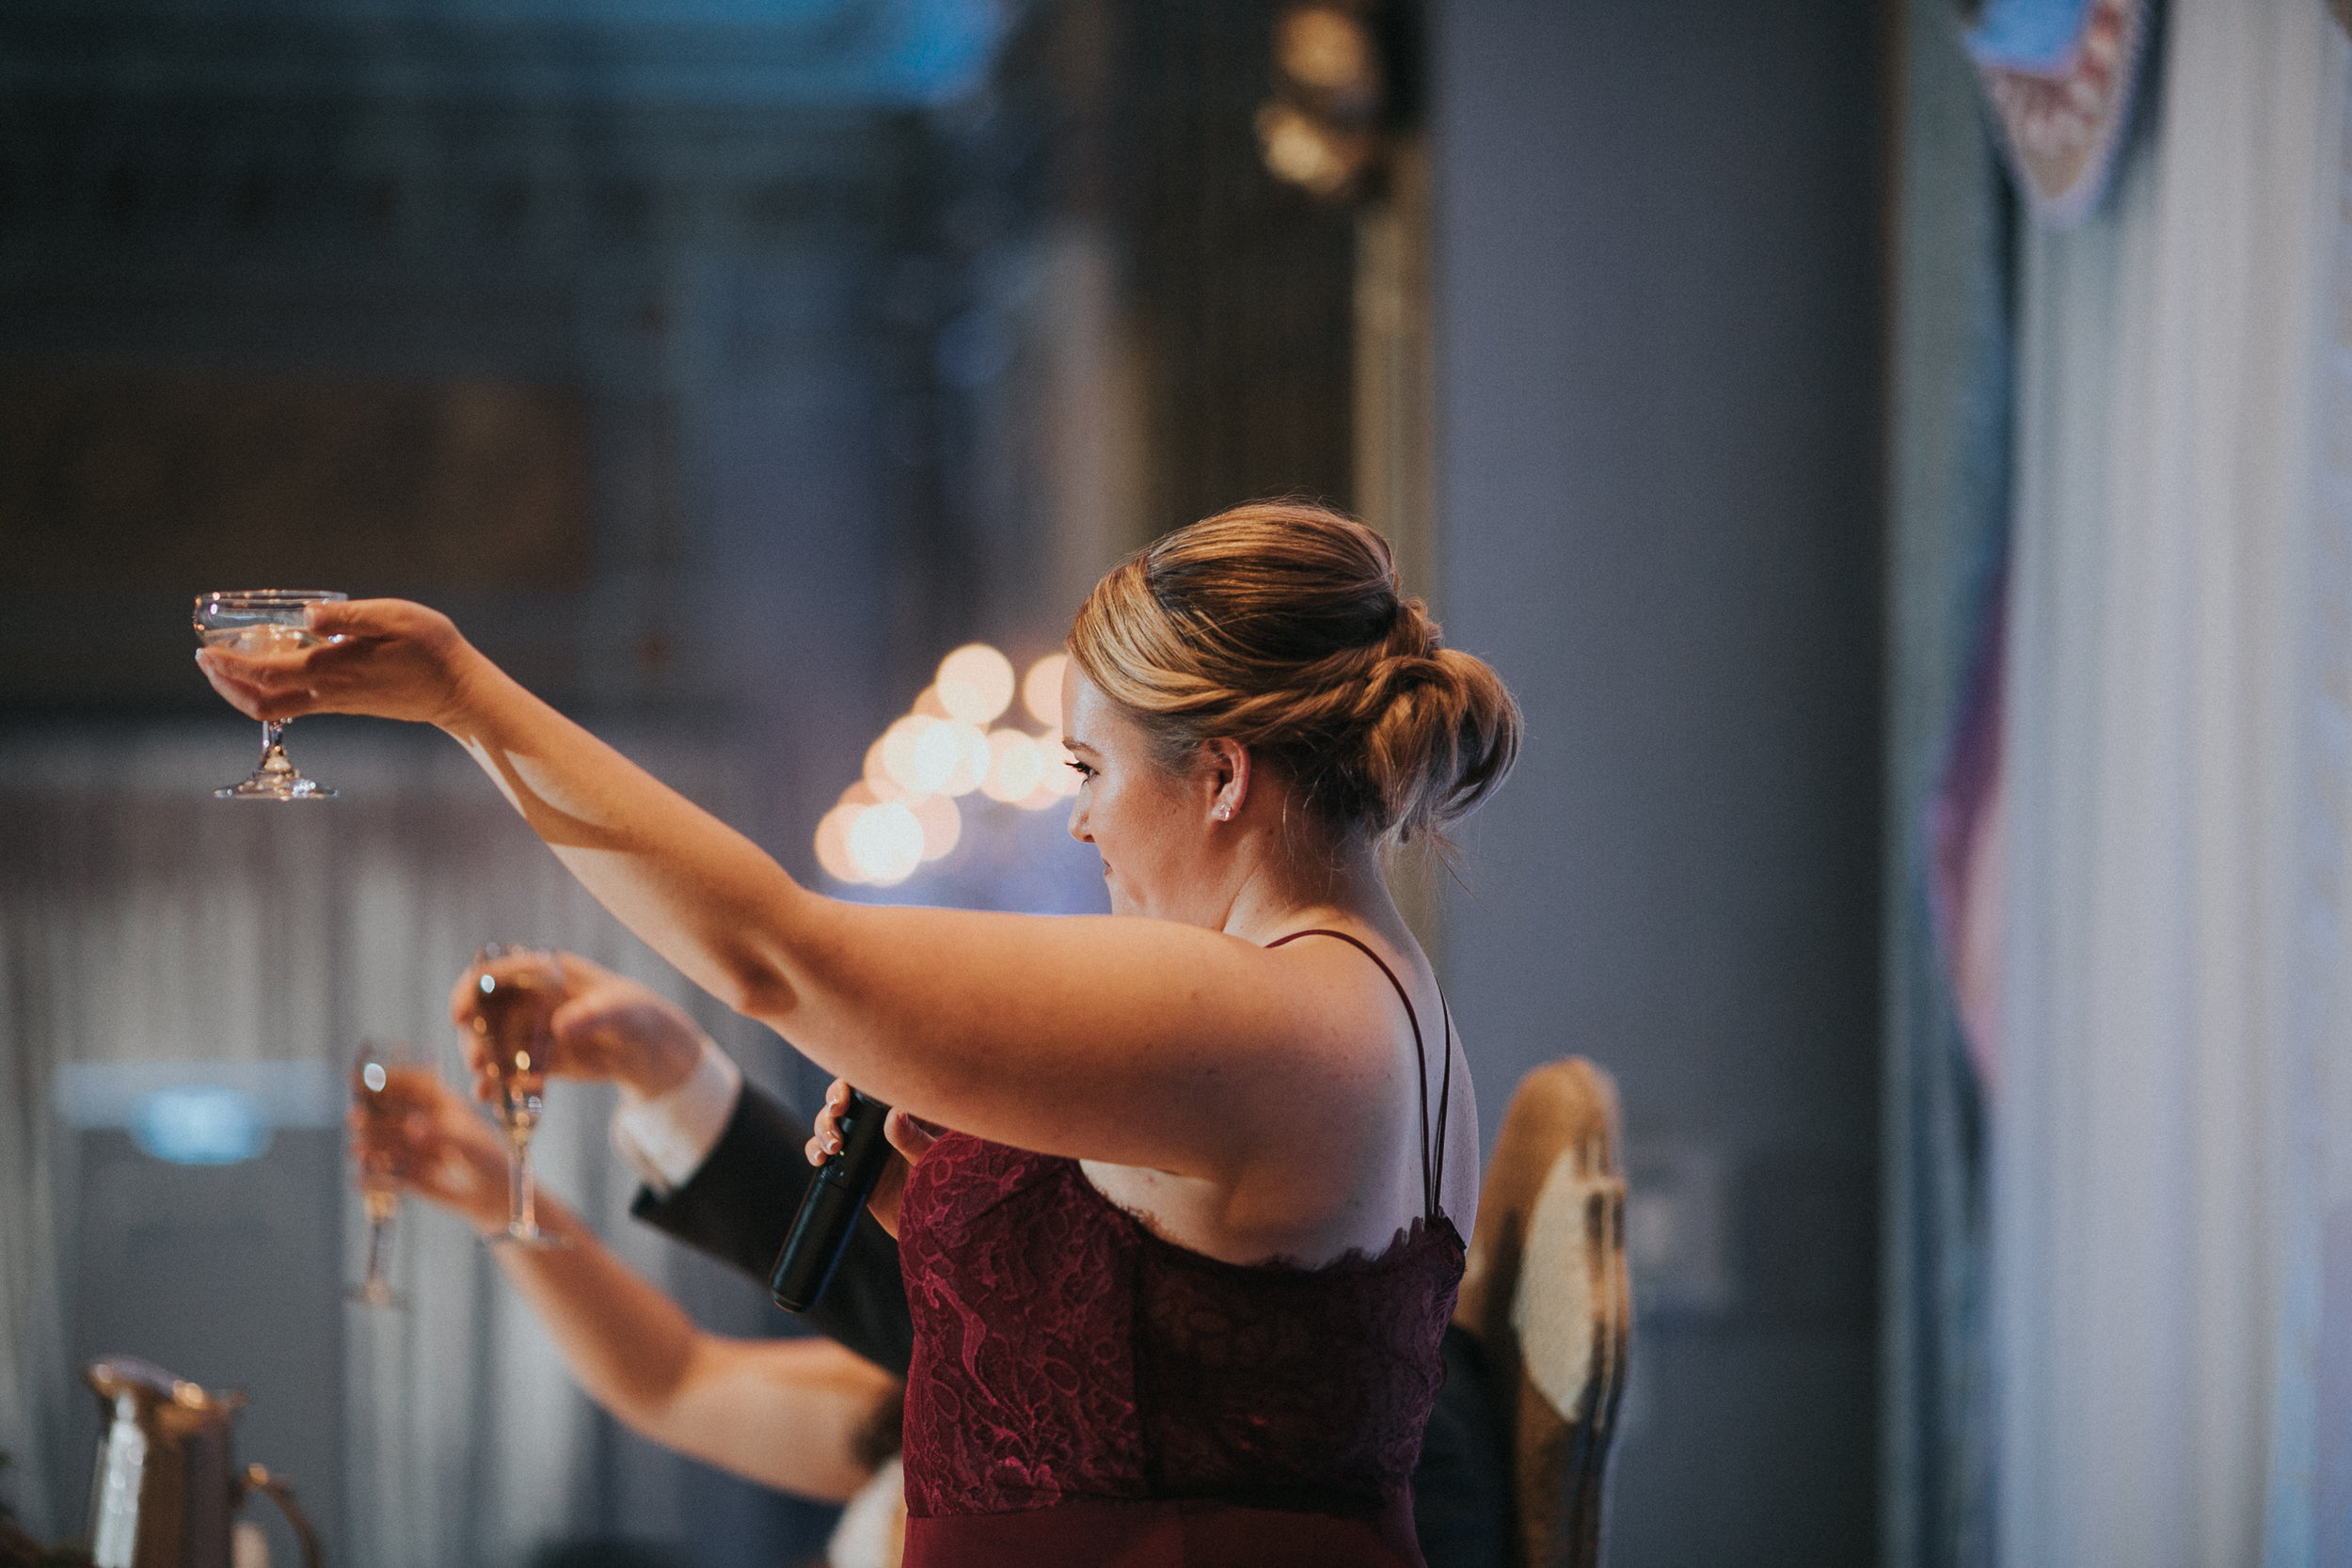 New-Jersey-Wedding-Photography-Fishers-Tudor-House-JennaLynnPhotography-Reception-Kathleen&Eddie-140.jpg